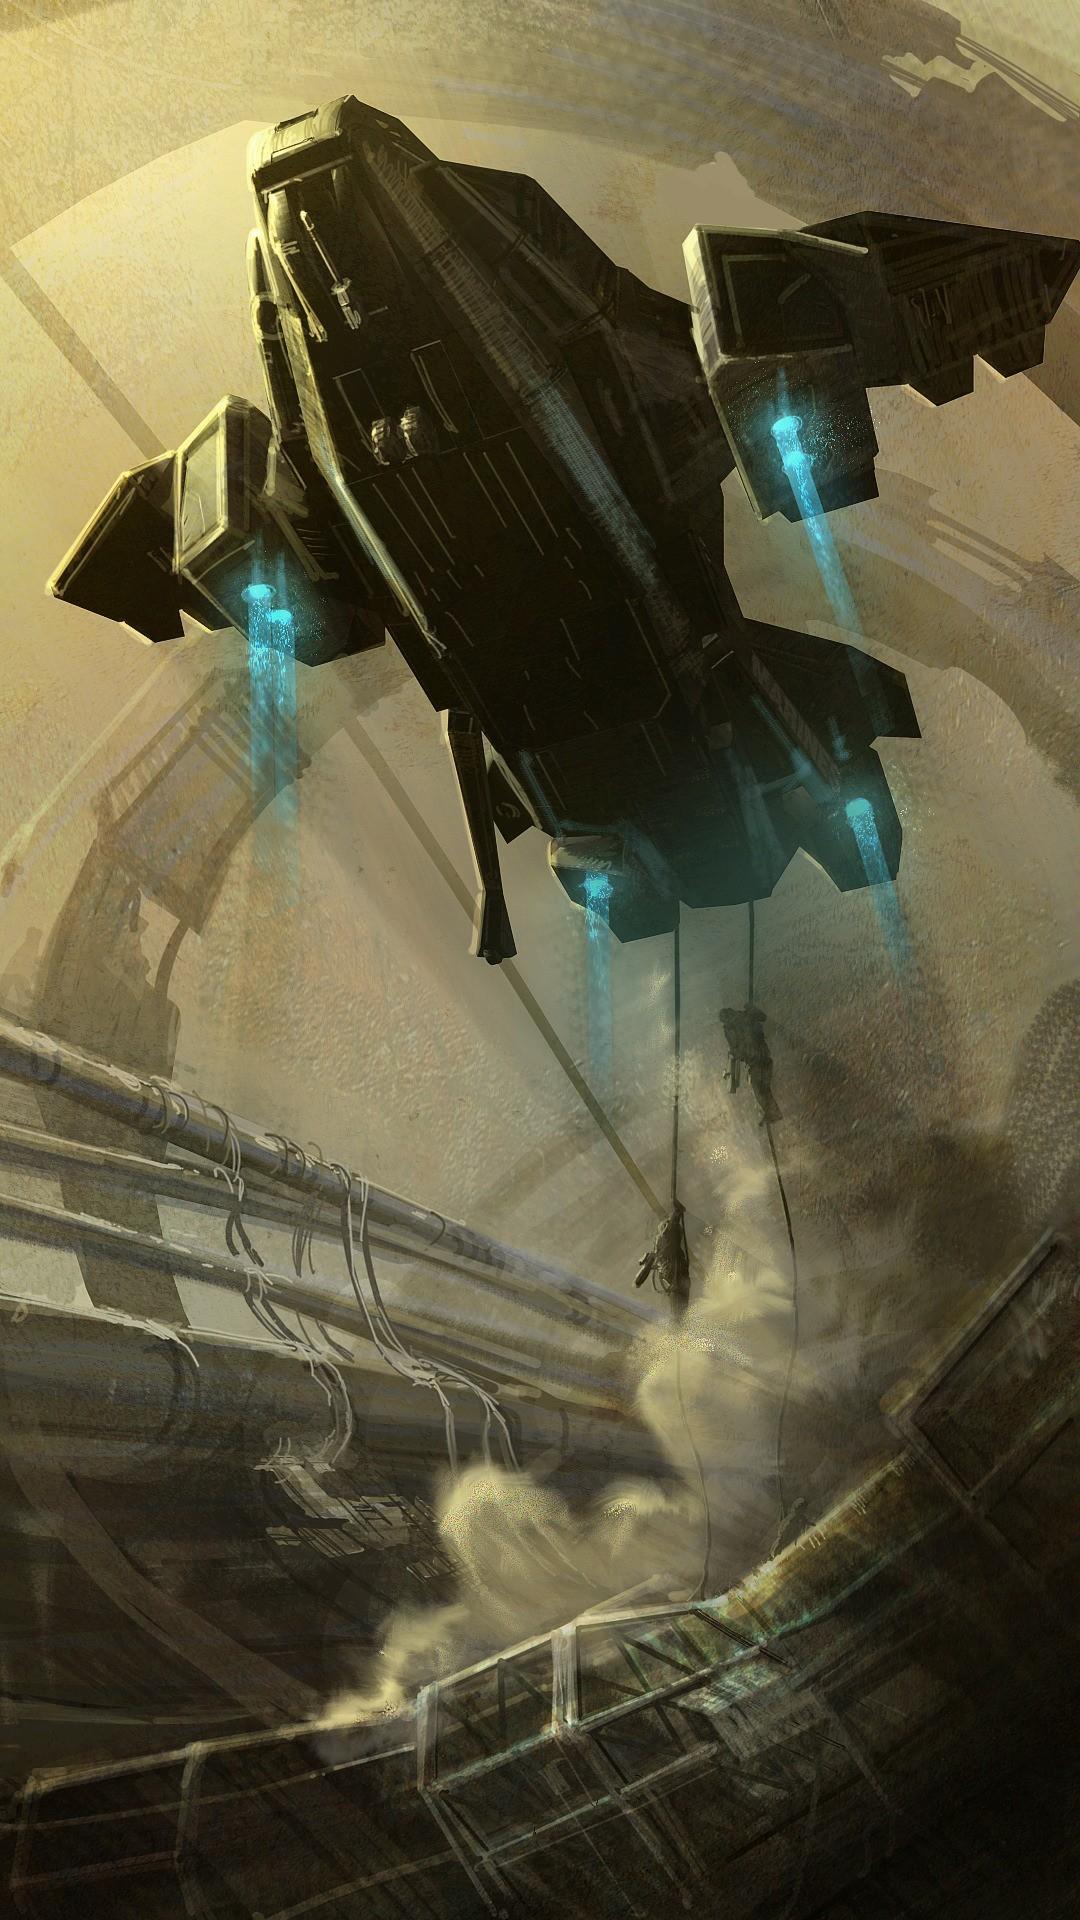 Res: 1080x1920, Artwork liftoff space elevator pelican sandstorms unsc wallpaper